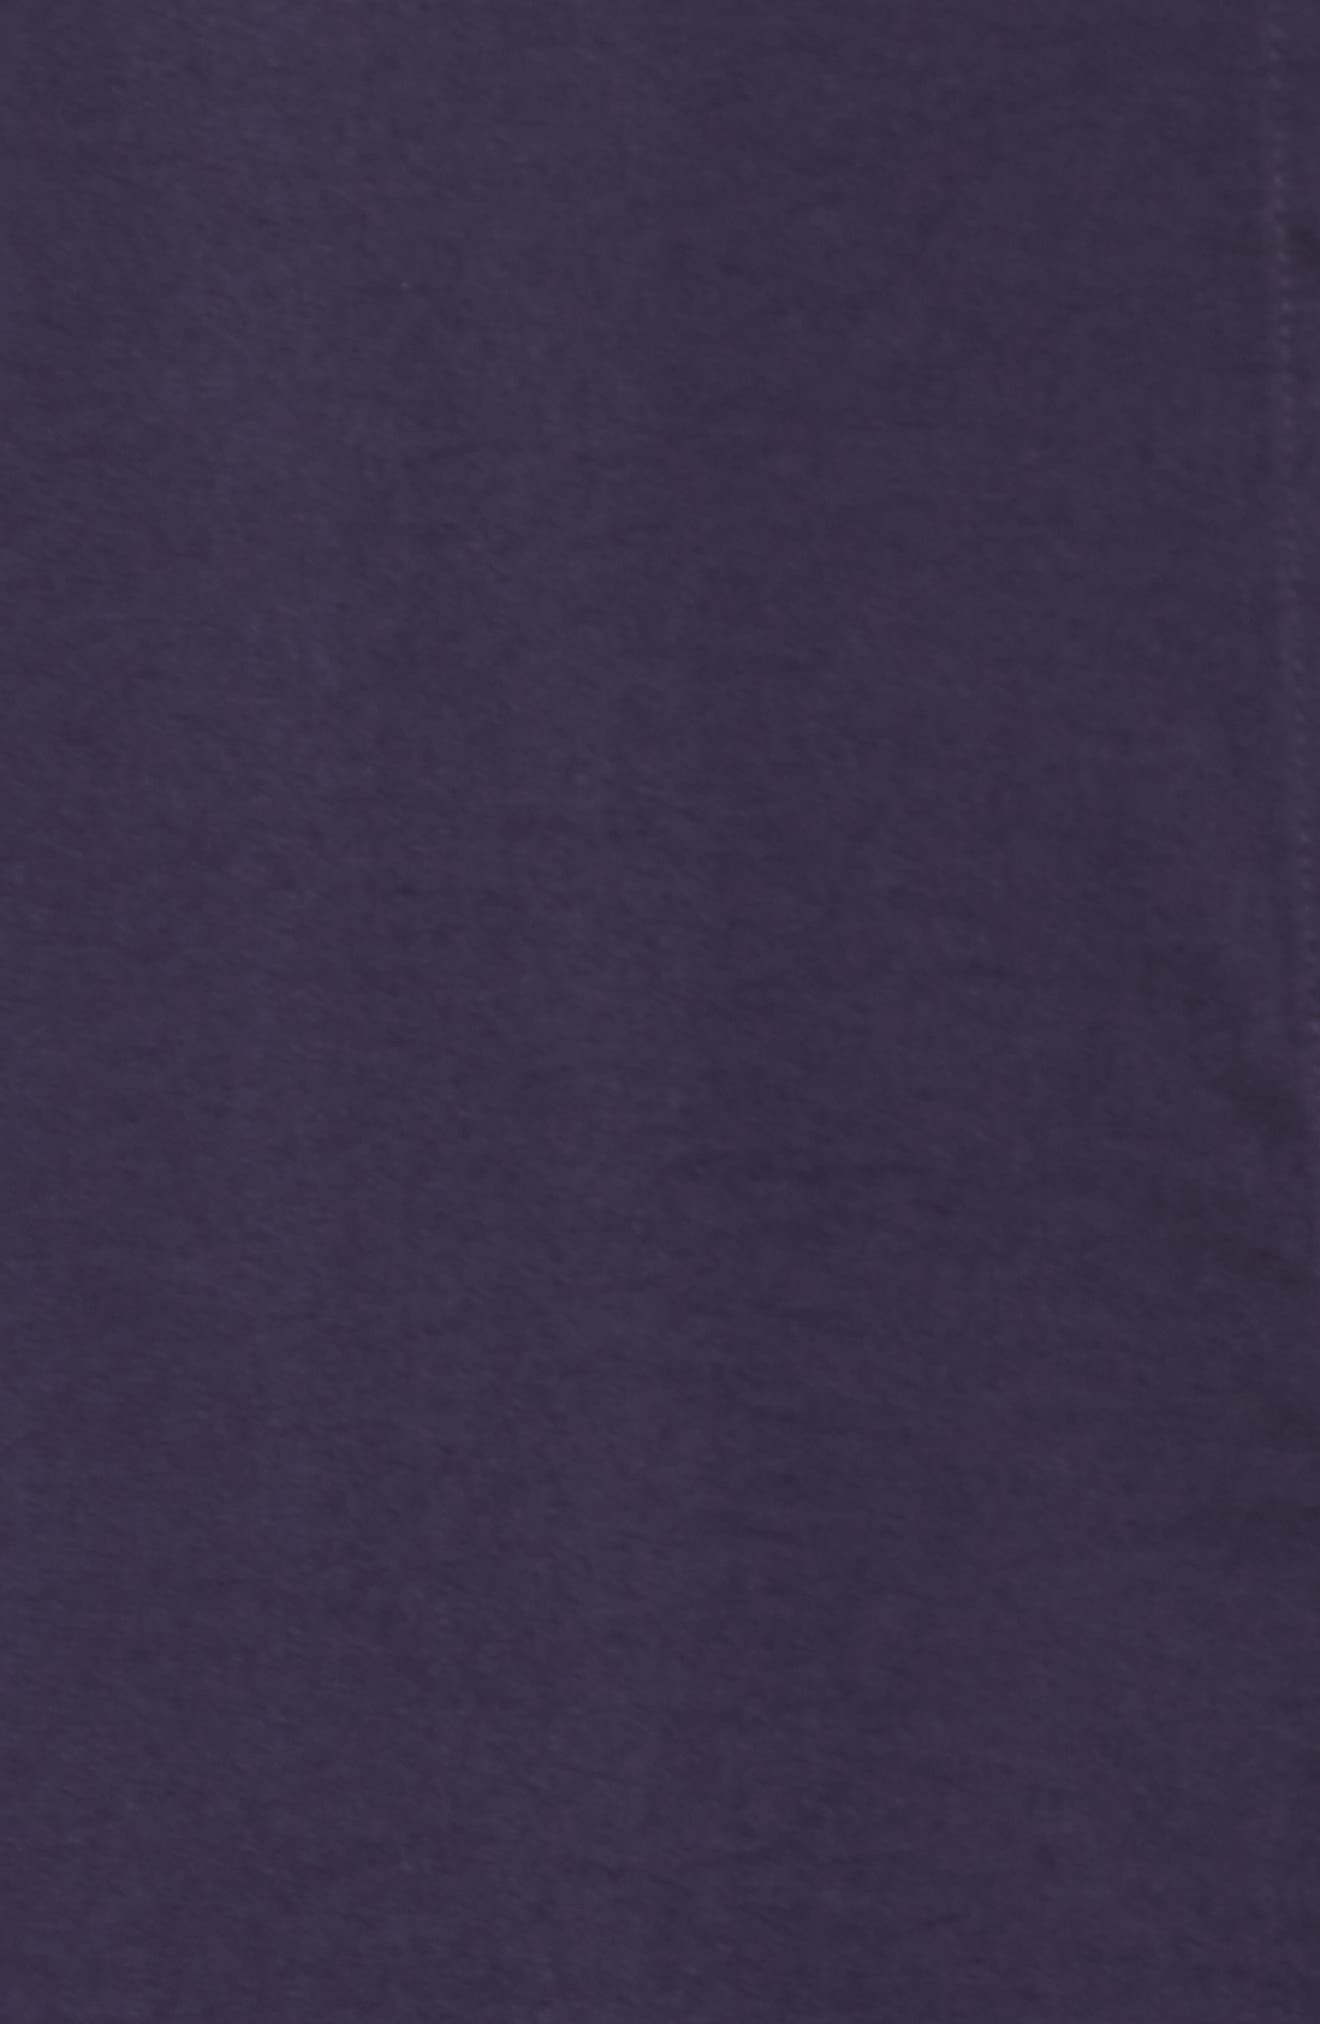 Washed Satin Maxi Sleep Shirt,                             Alternate thumbnail 10, color,